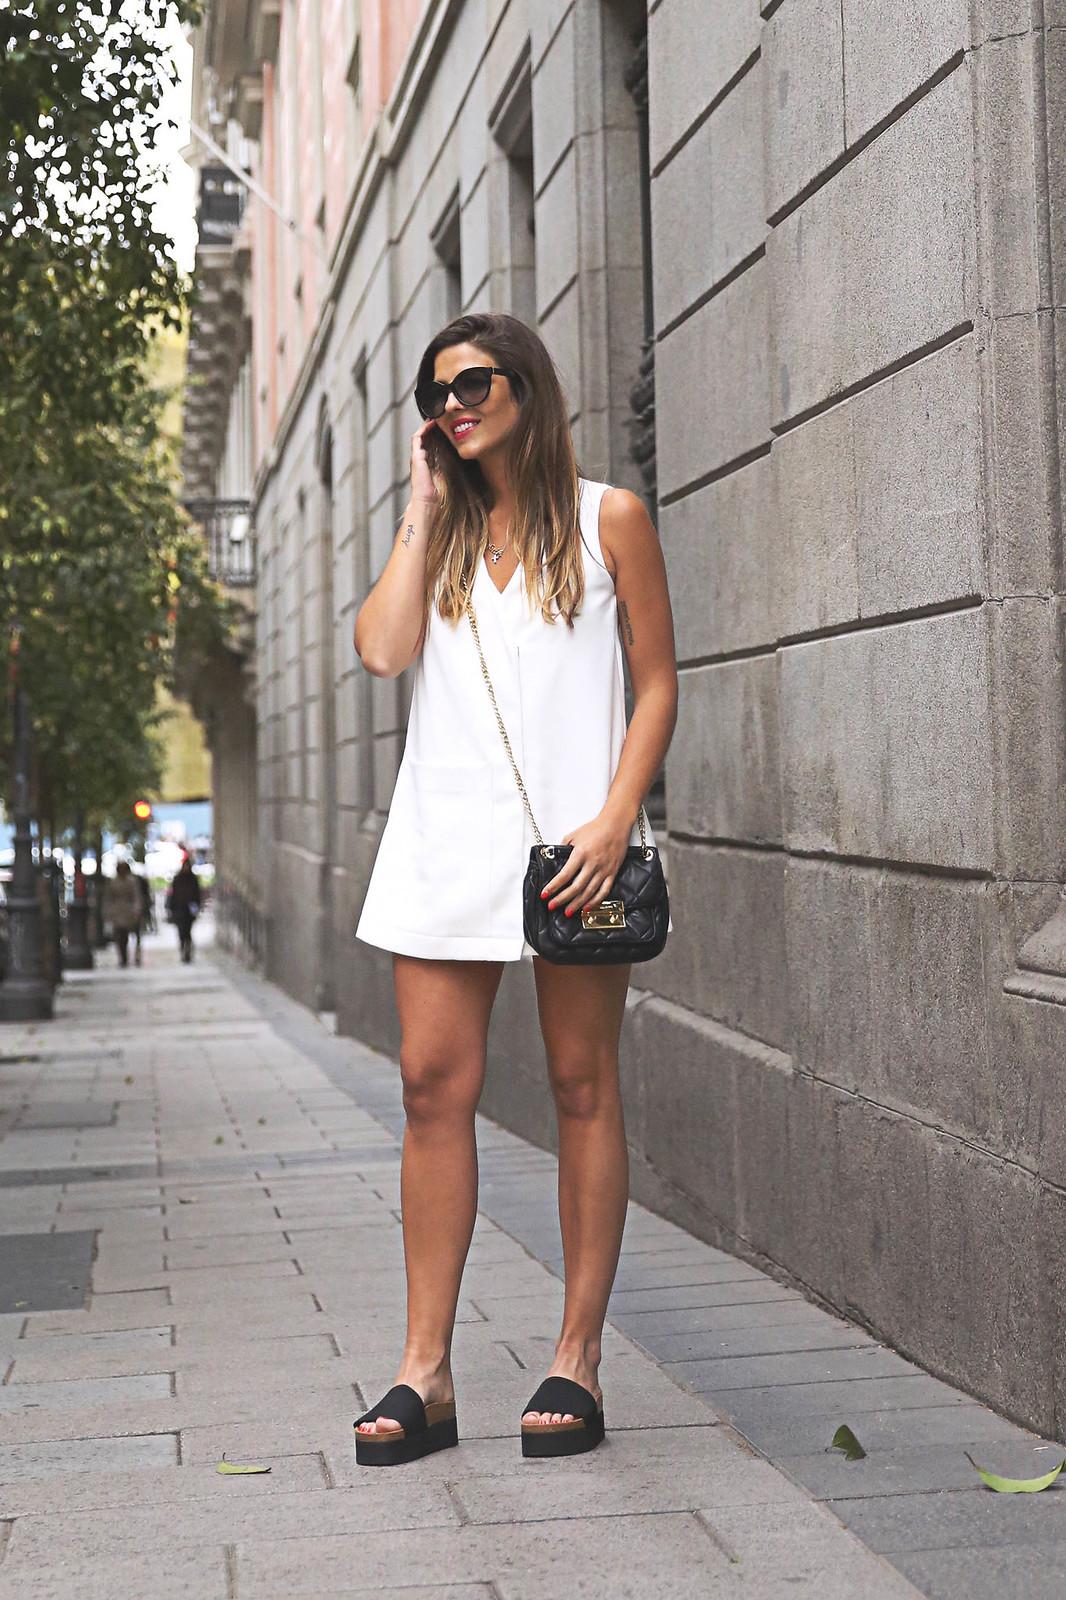 trendy-taste-look-outfit-street-style-ootd-blog-blogger-fashion-spain-moda-españa-steve-madden-mono-overall-playsuit-sandalias-michael-kors-white-blanco-3